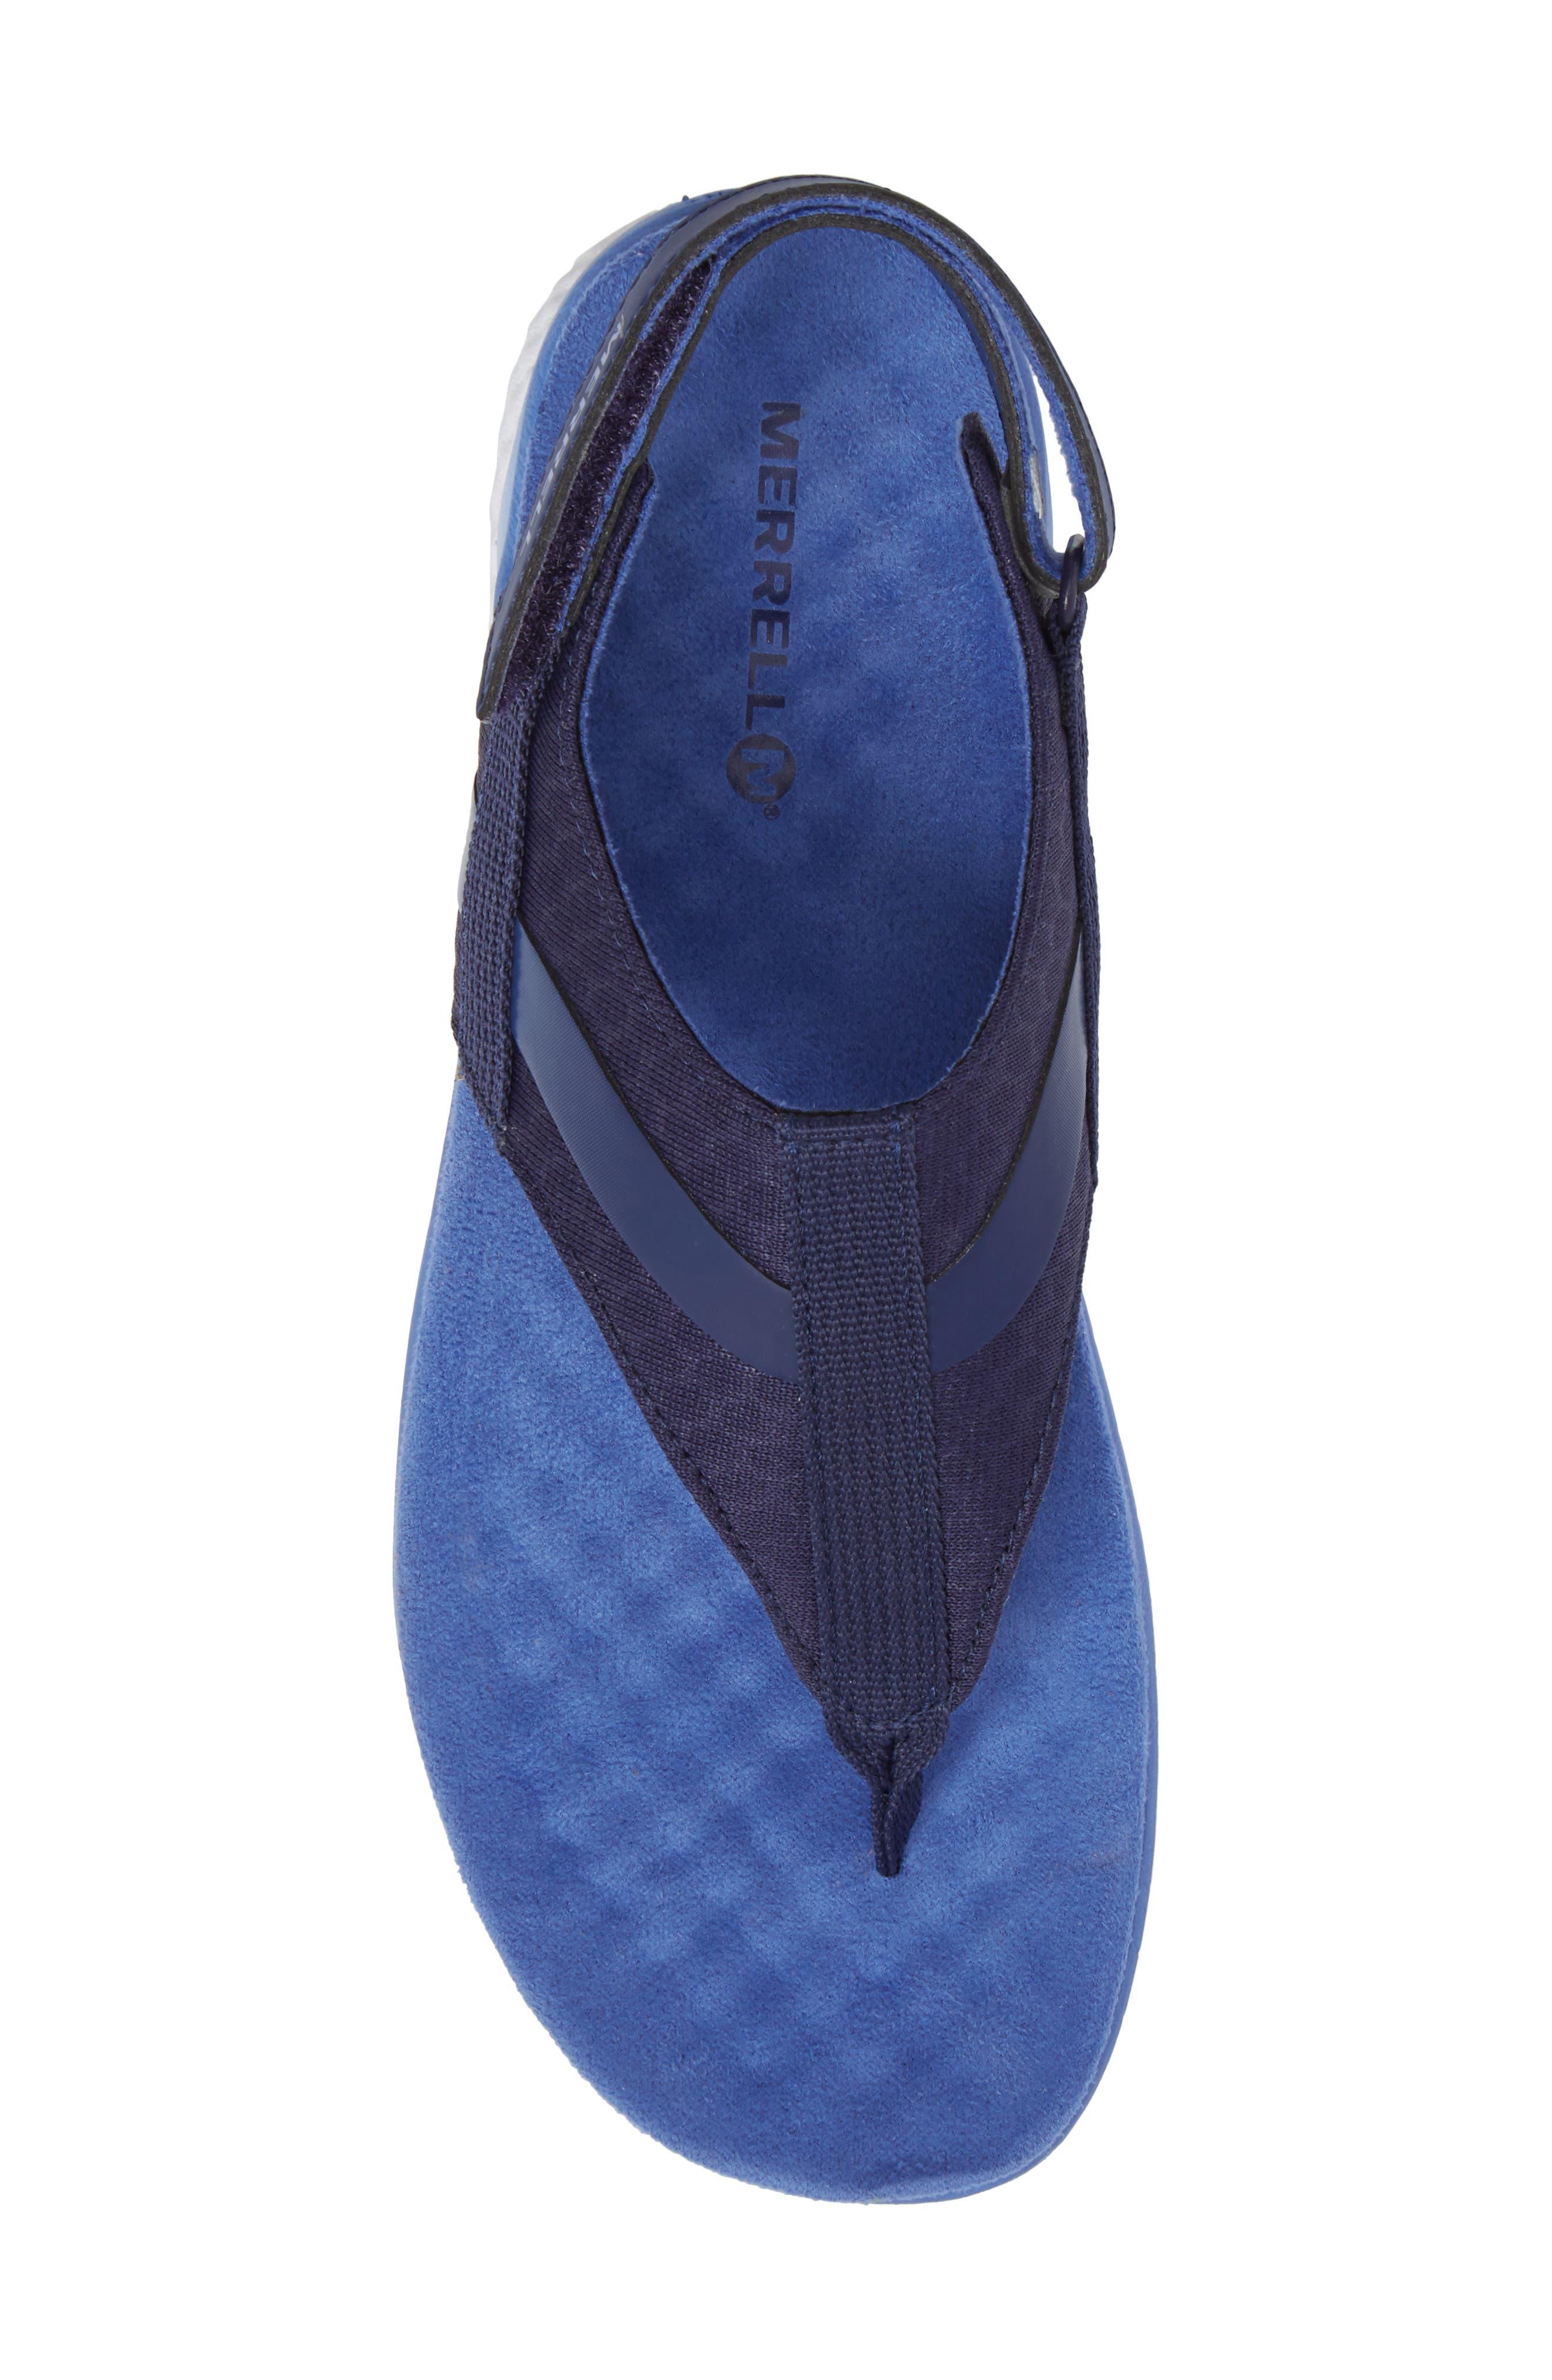 1SIX8 Linna Slide Air Cushion+ Sandal,                             Alternate thumbnail 19, color,